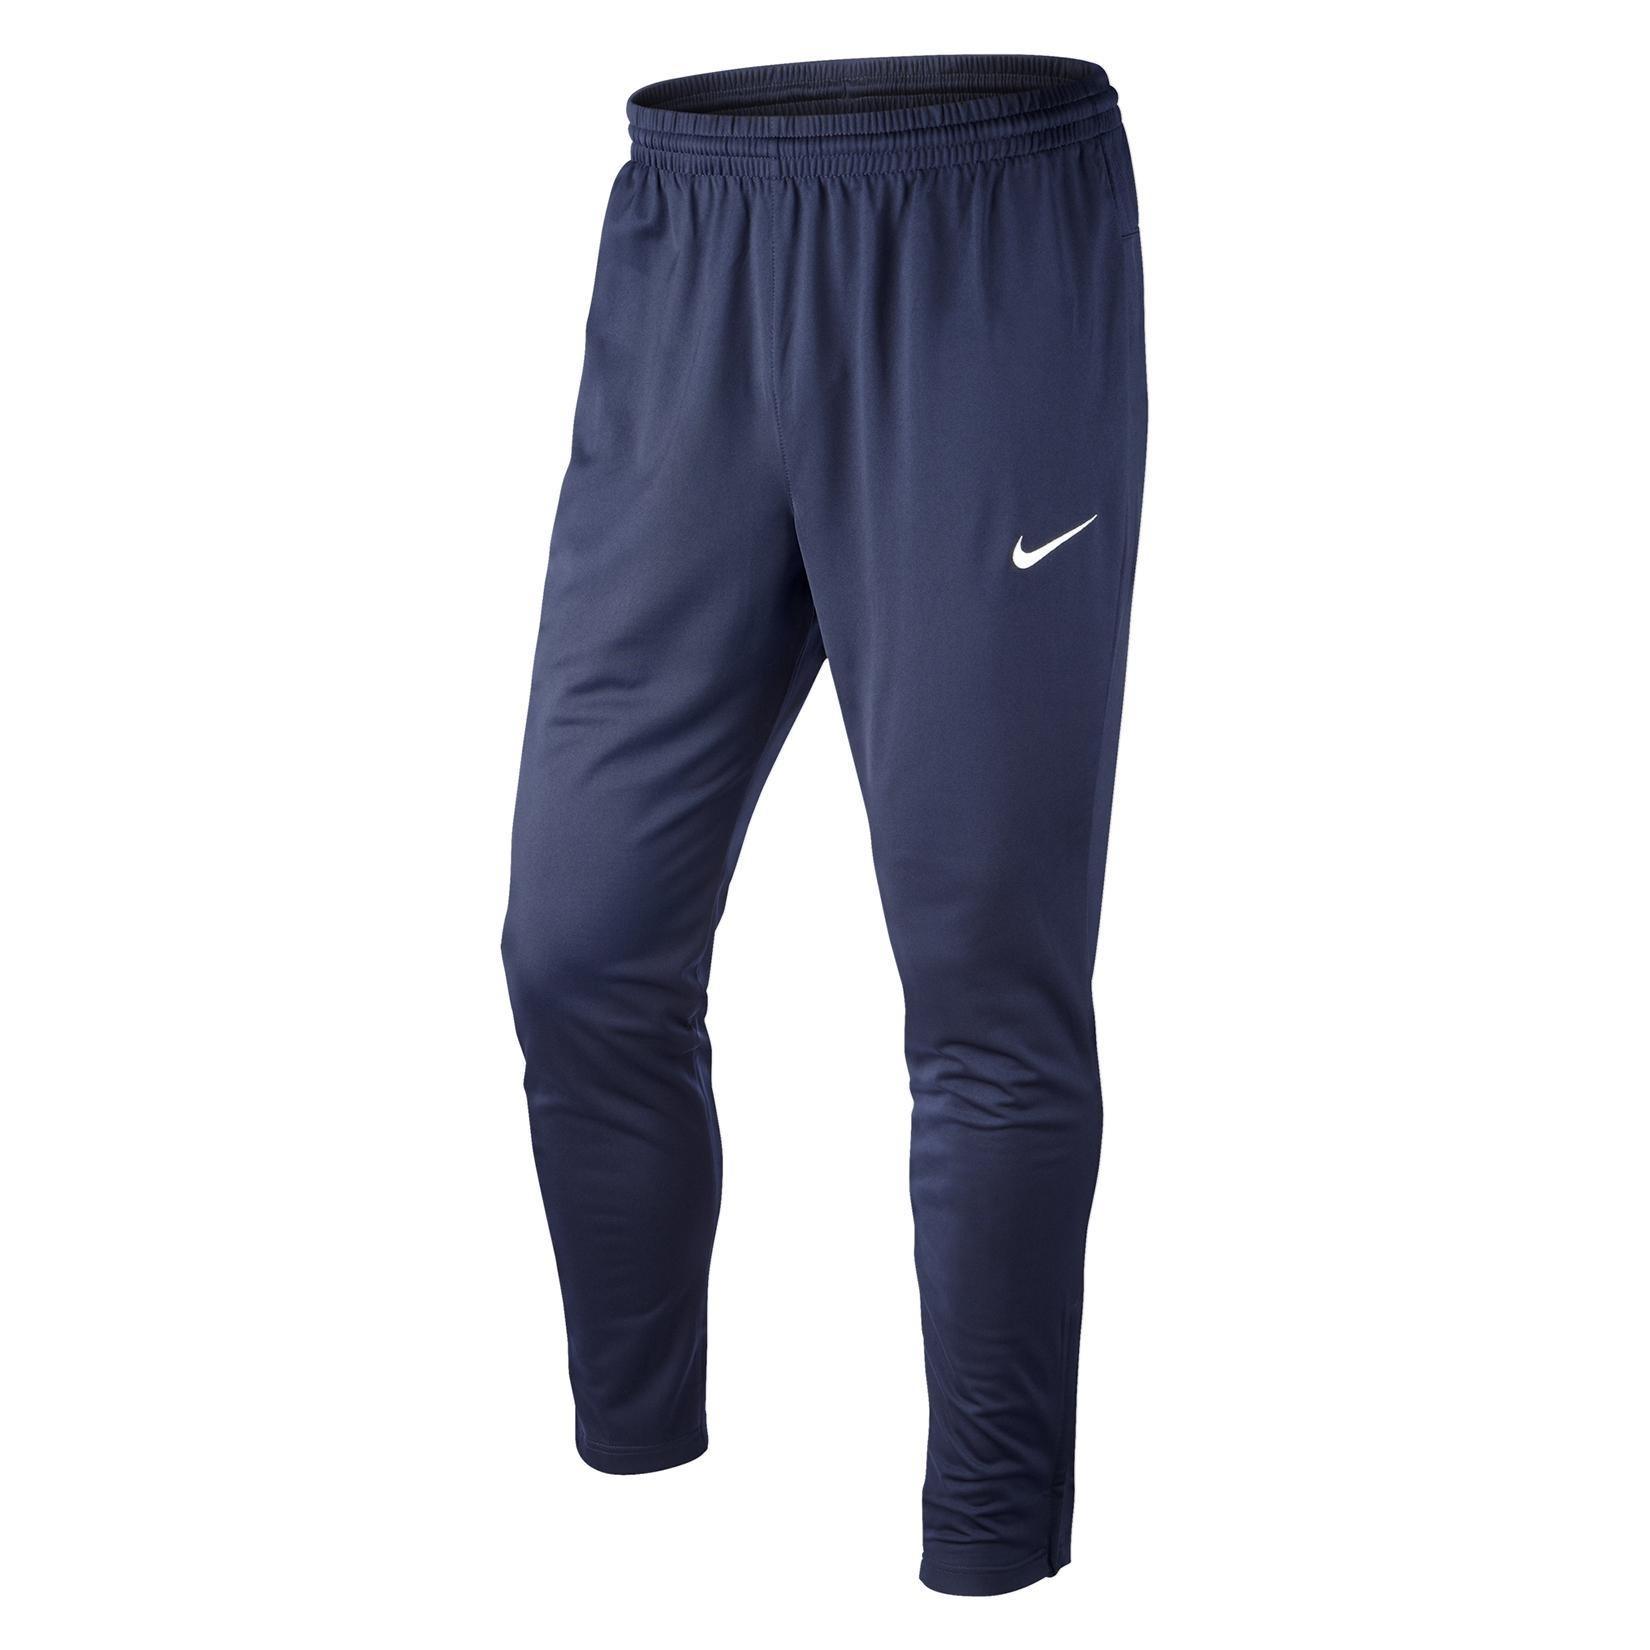 fe3cb05e Спортивные штаны Nike Libero Tech Knit Training Pant ZAF